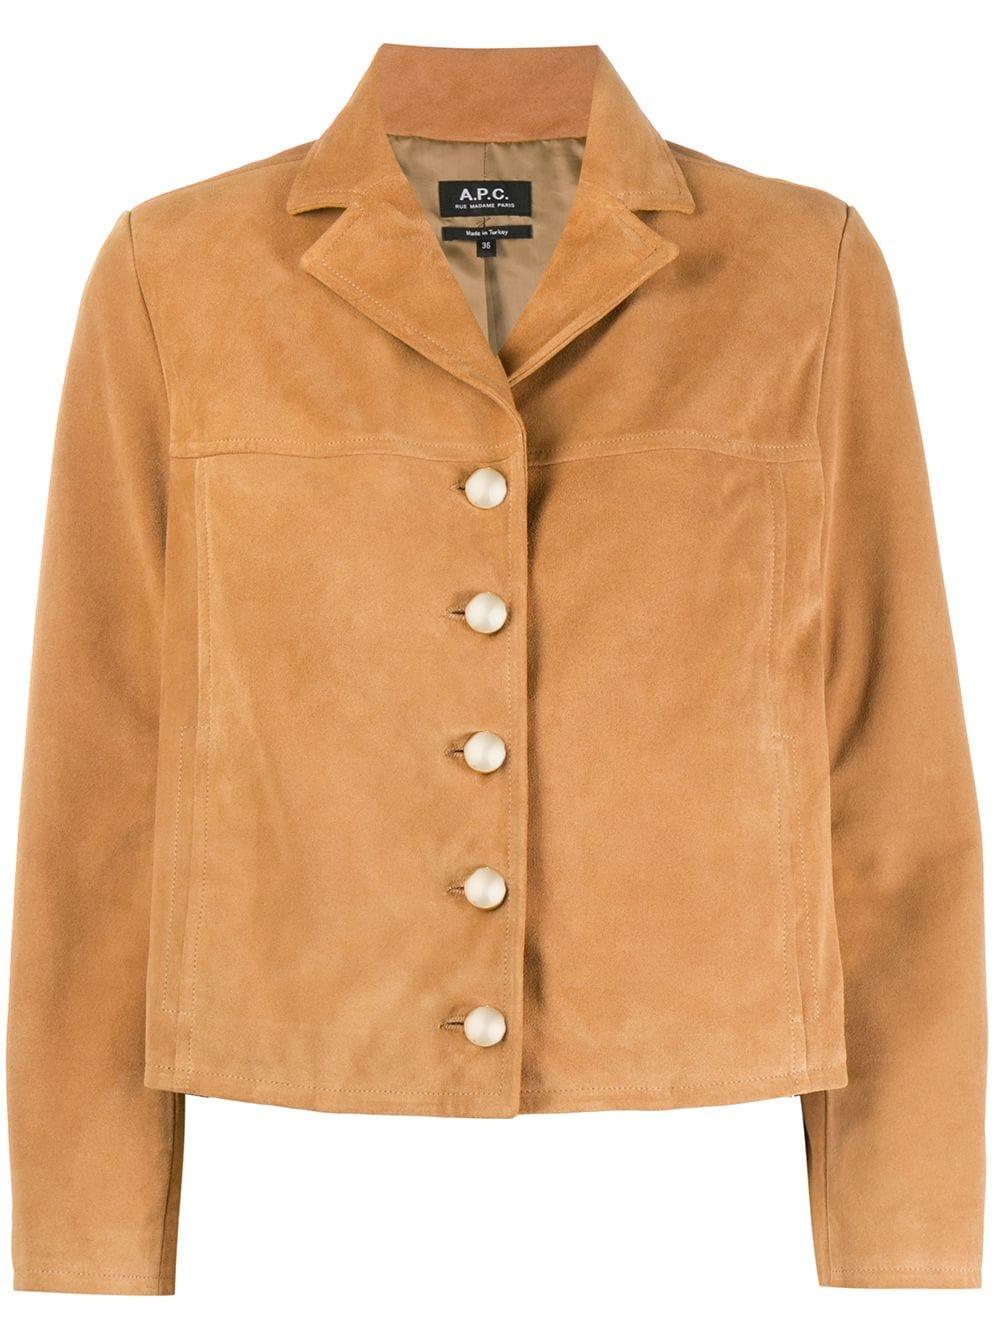 Picture of A.P.C. | Notched-Lapel Button-Through Jacket